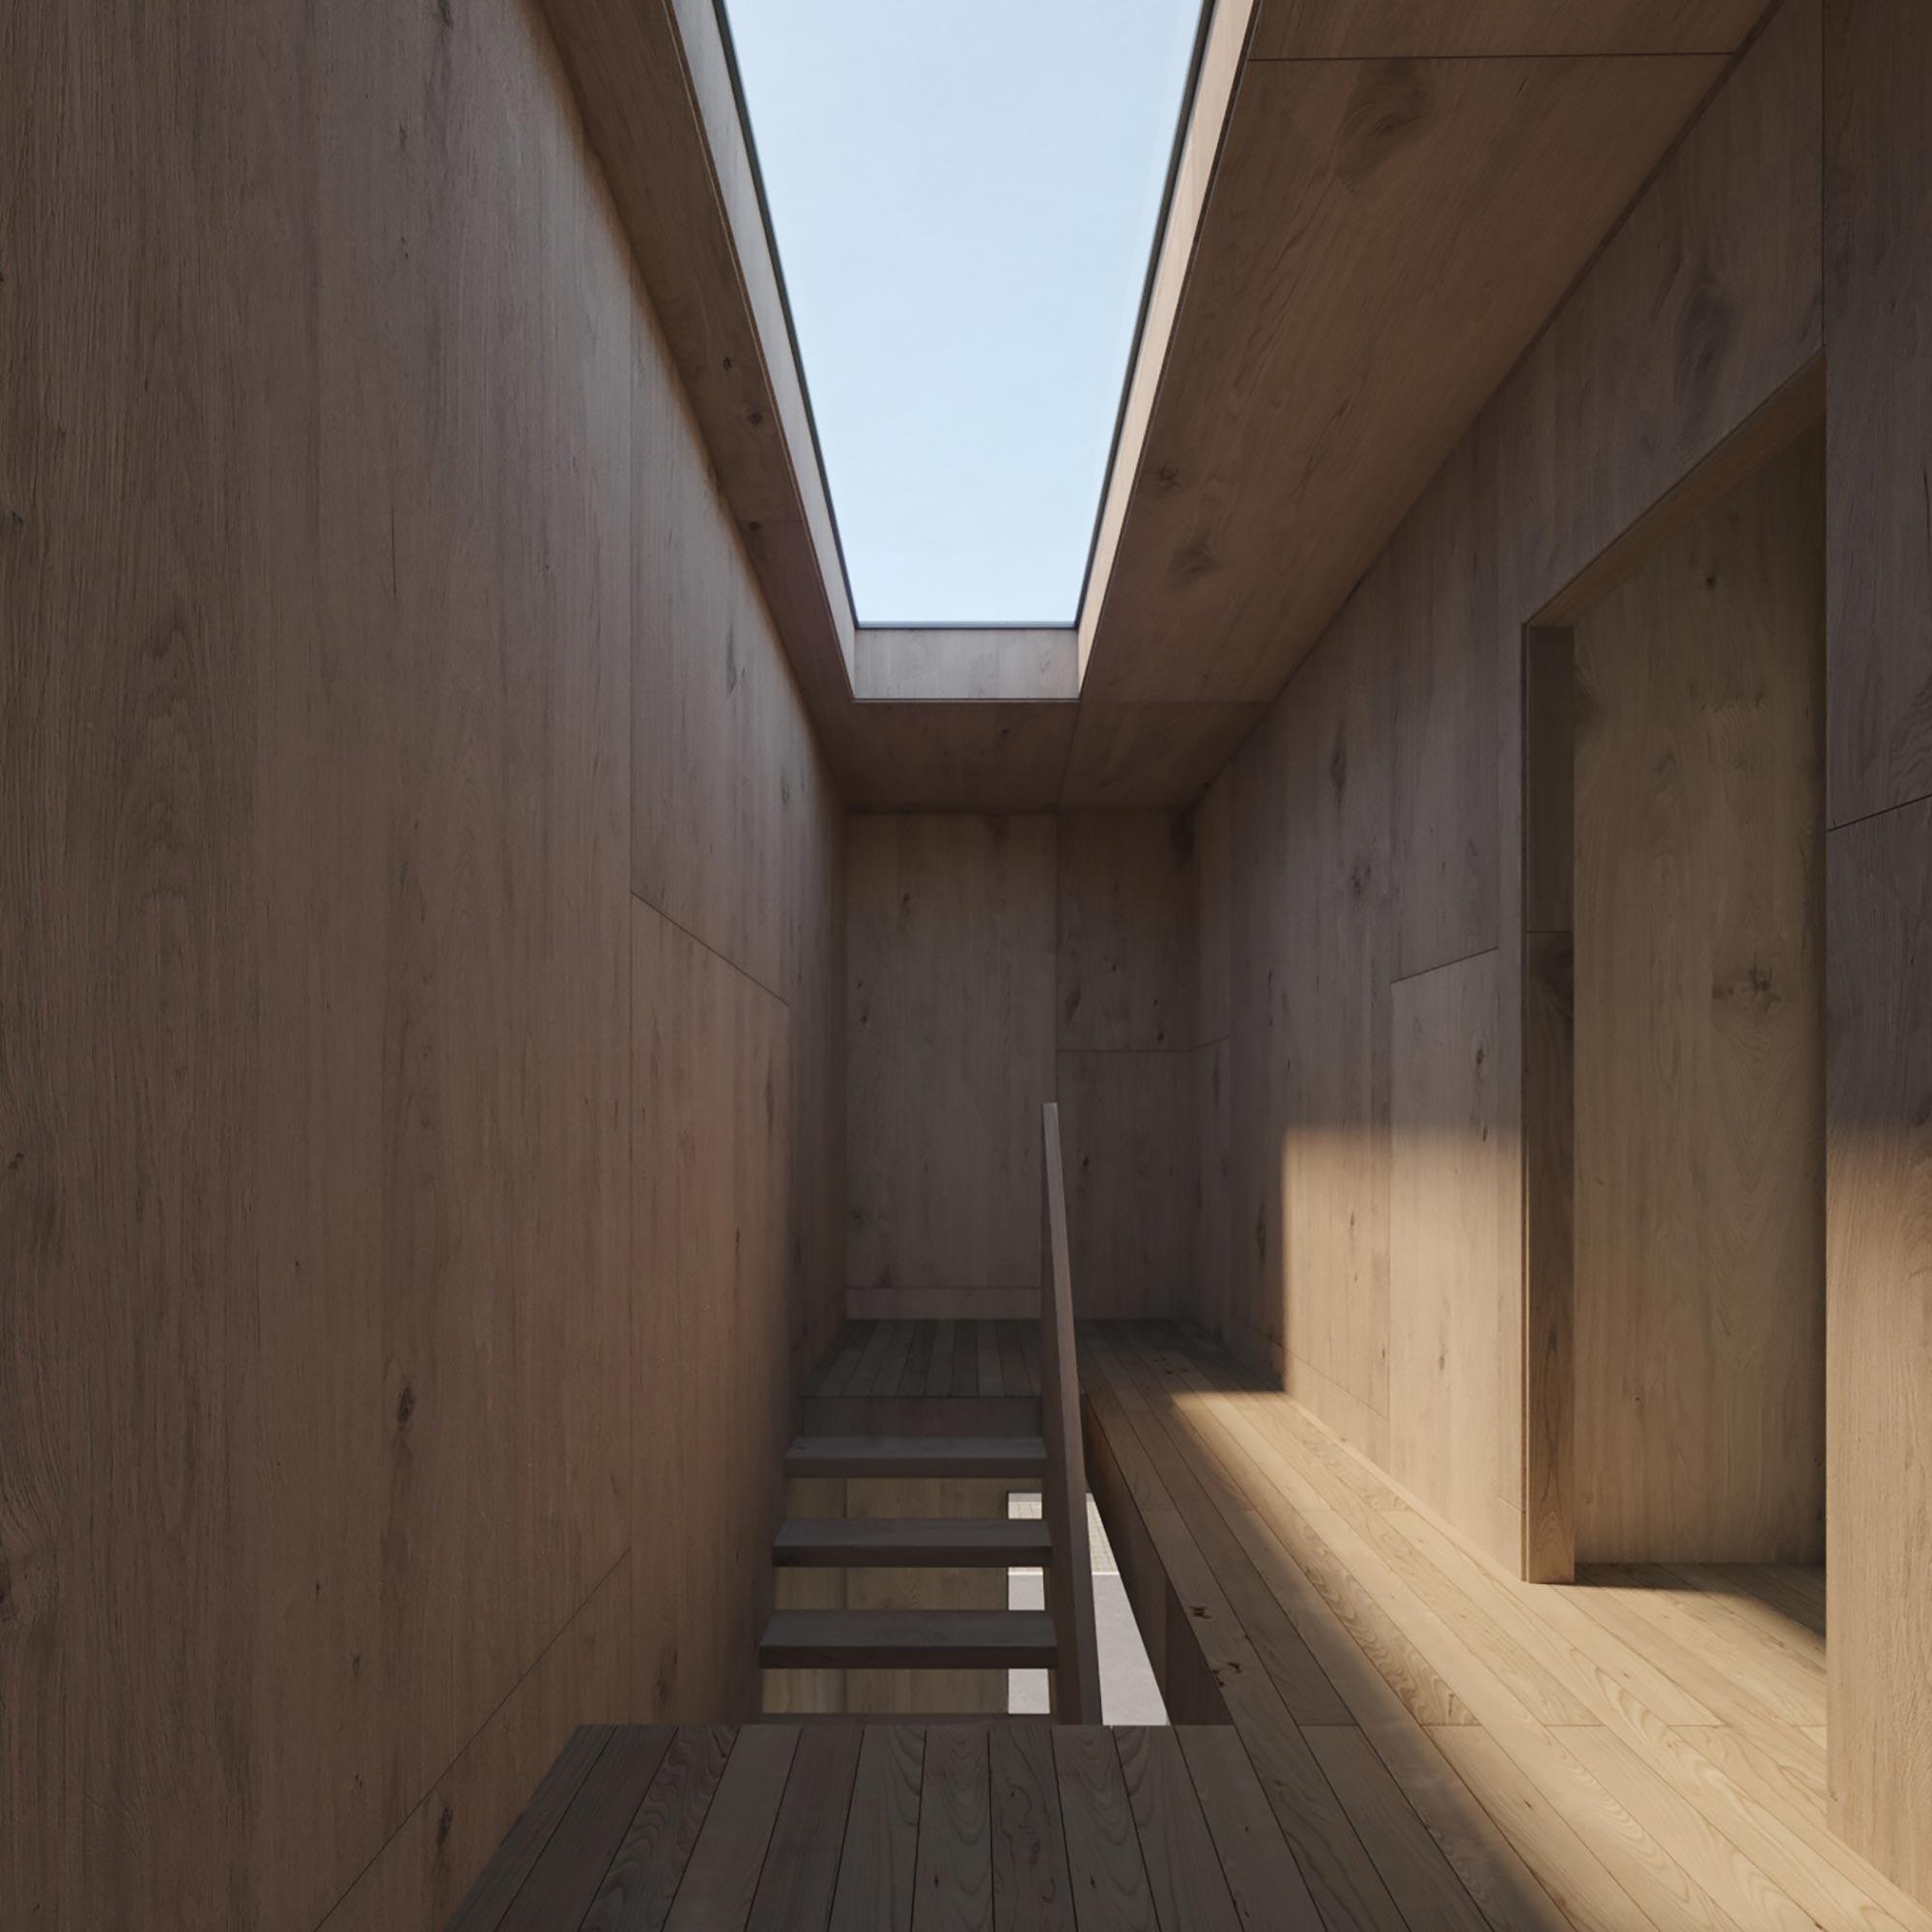 cube-haus-adjaye-associates-architects-cs-2000px-05